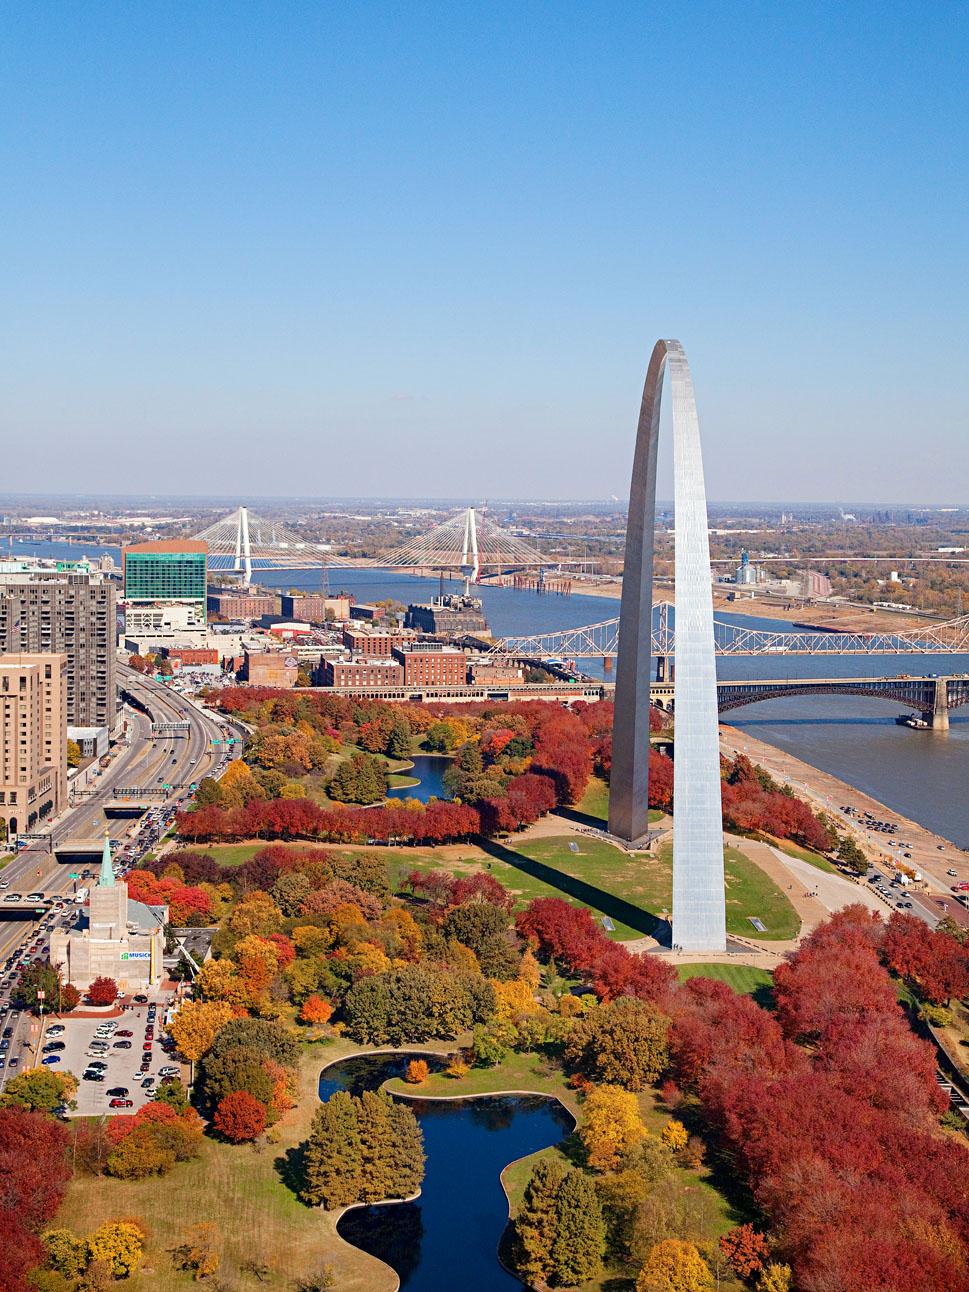 Top attractions in Missouri